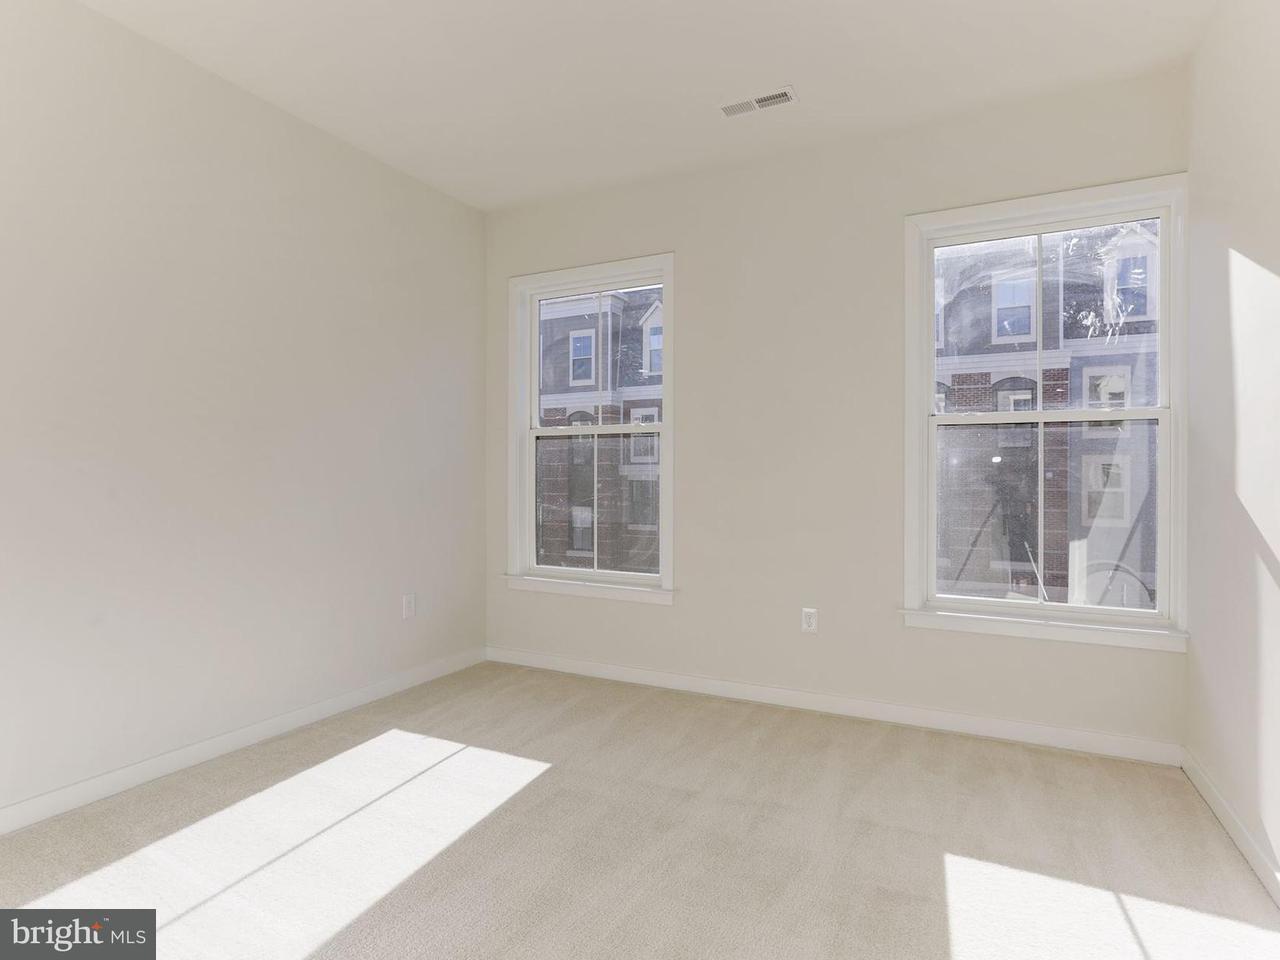 Additional photo for property listing at 10718 Viognier Ter #0 10718 Viognier Ter #0 Fairfax, Виргиния 22030 Соединенные Штаты